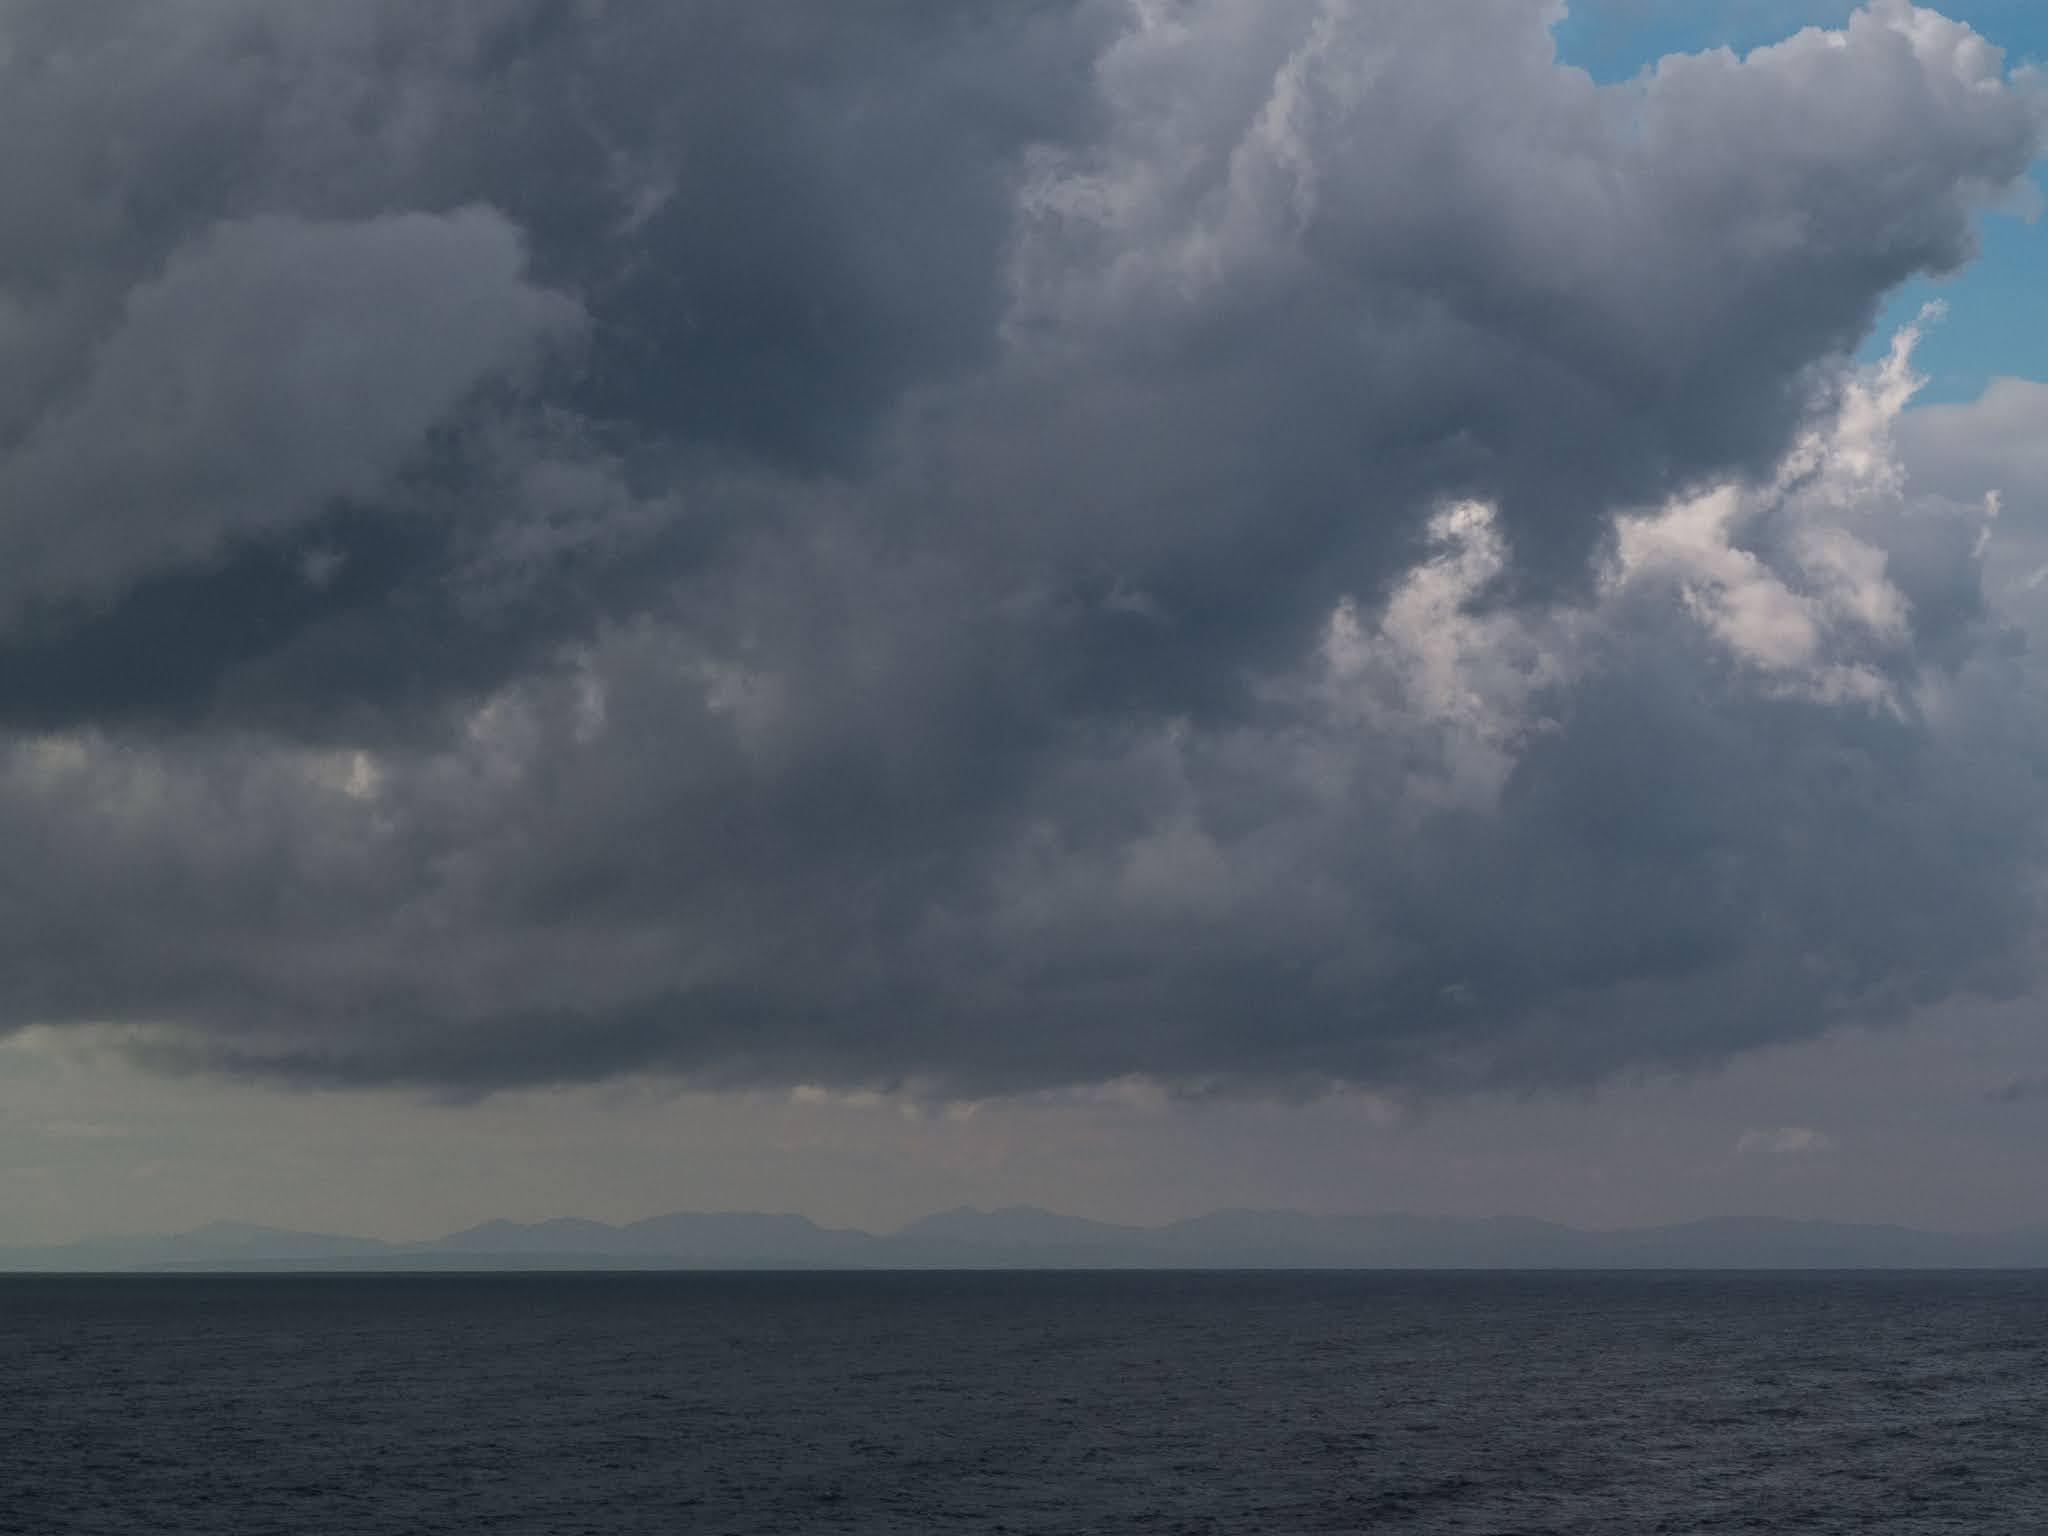 Rain clouds over a mountainous coast line on the Mediterranean Sea.